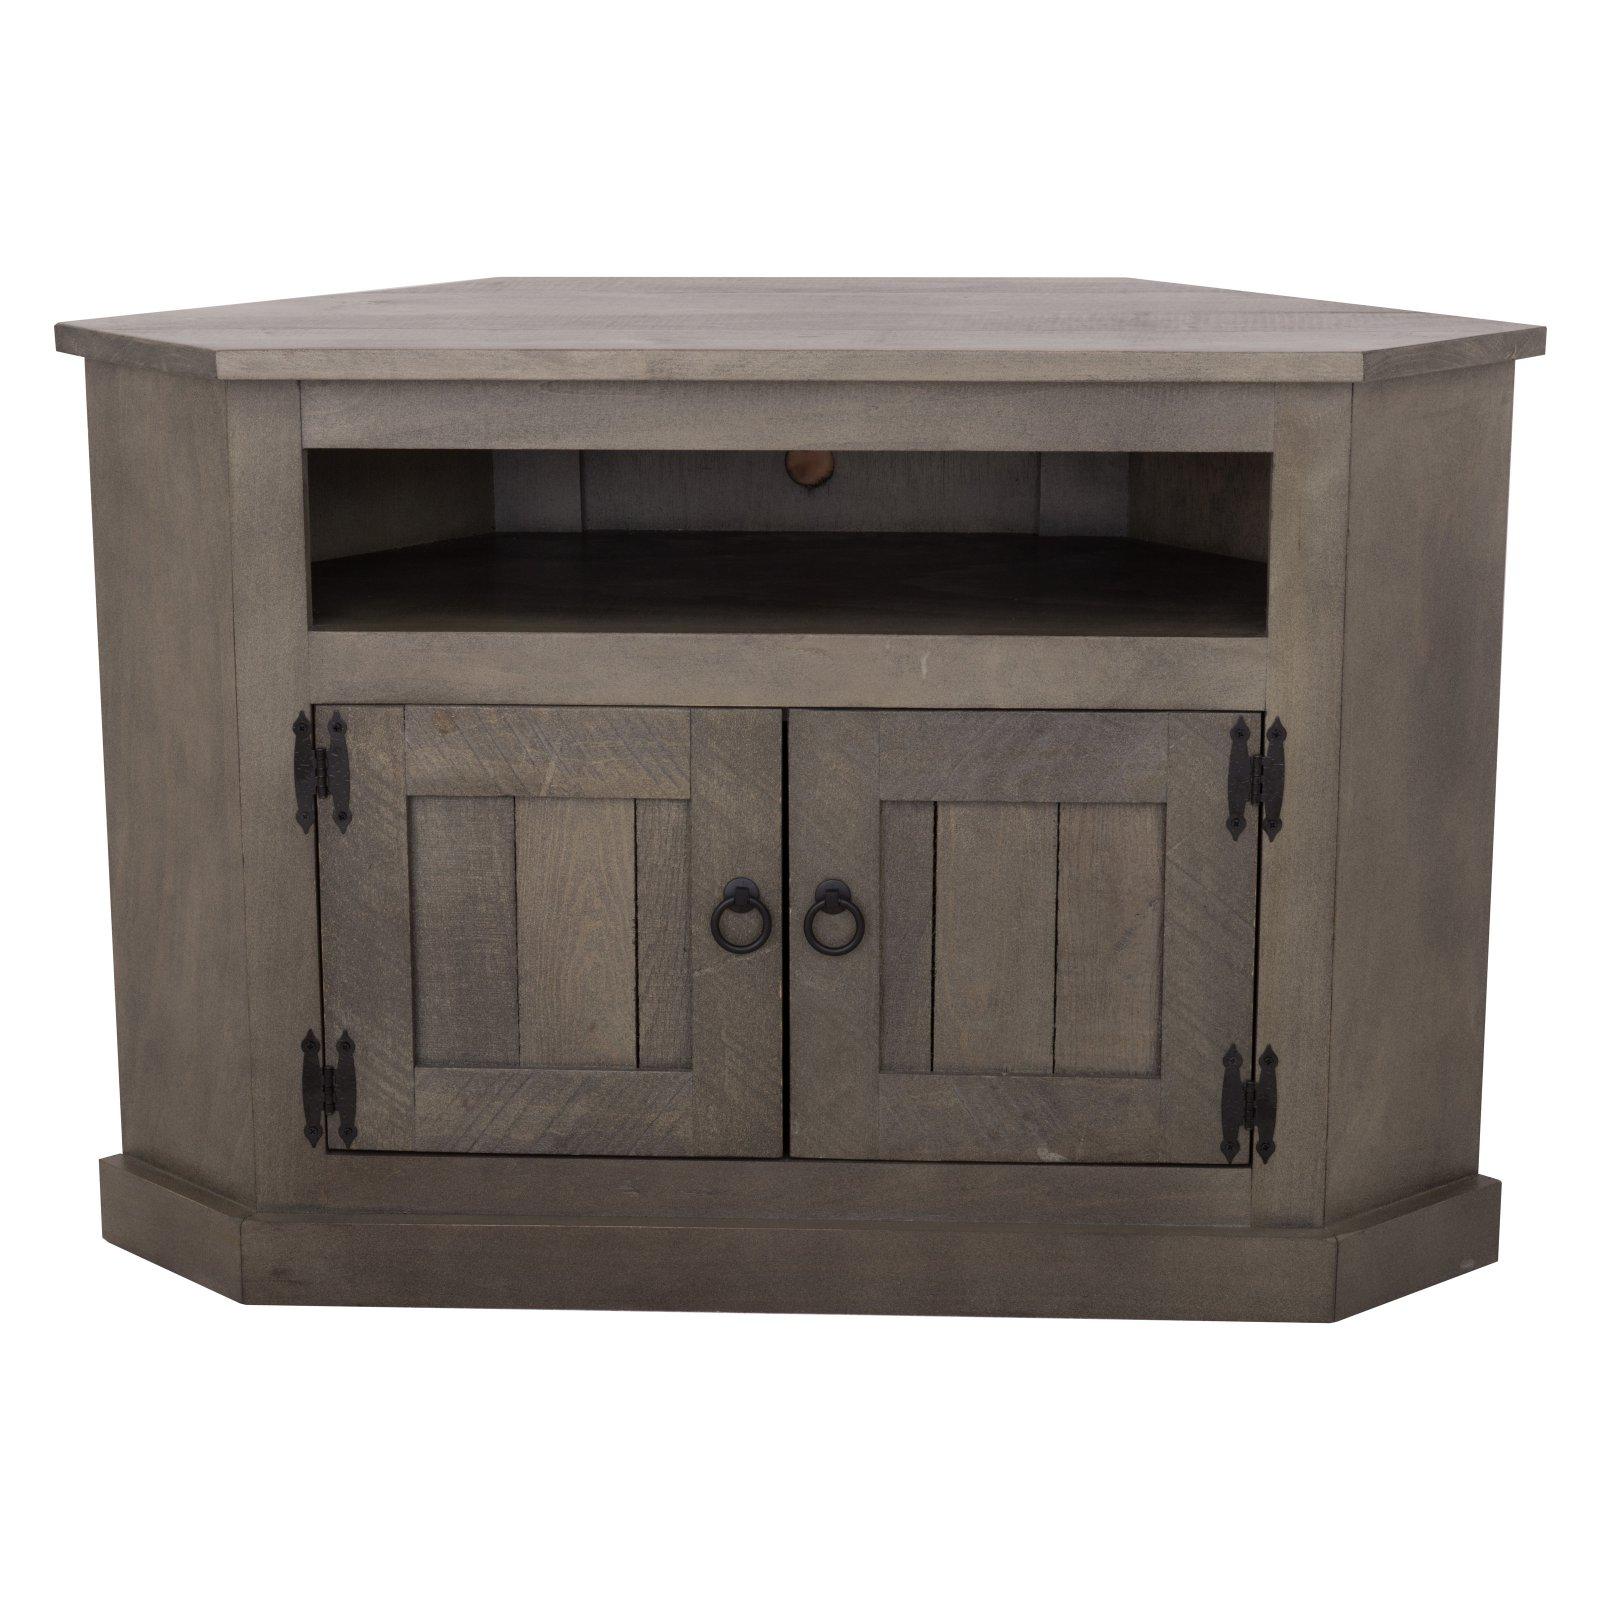 outlet store 6e8dc 11921 Eagle Furniture Rustic Stone Corner TV Stand